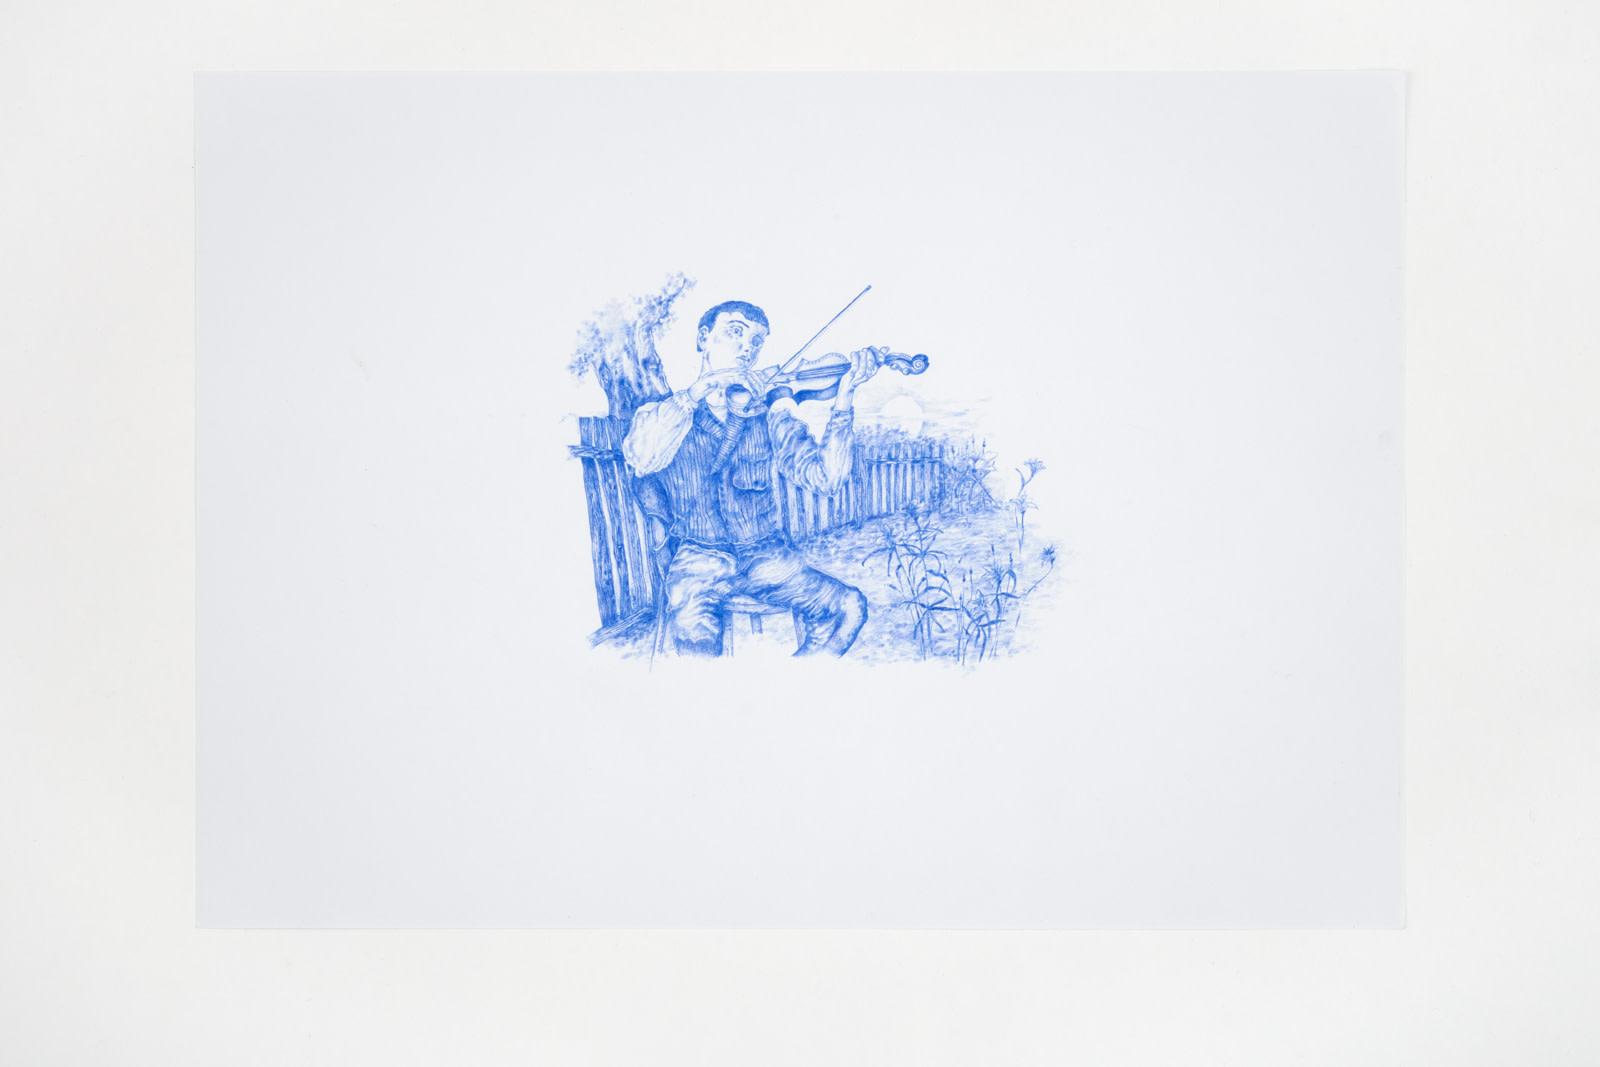 "<div class=""artwork_caption""><div class=""title""><em>Untitled</em>, 2020</div><div class=""medium"">coloured pencil on paper</div><div class=""dimensions"">site size: 30.4 x 45.4 cm / 12 x 17 ⅞ in<br />frame size: 34.1 x 46.4 x 2.5 cm / 13 ⅜ x 18 ¼ x 1 in</div></div><div class=""link""><span class=""website_contact_form"" data-contact-form-details=""Untitled , 2020  coloured pencil on paper  site size: 30.4 x 45.4 cm / 12 x 17 ⅞ in frame size: 34.1 x 46.4 x 2.5 cm / 13 ⅜ x 18 ¼ x 1 in"" data-contact-form-image=""https://artlogic-res.cloudinary.com/w_200,h_200,c_fill,f_auto,fl_lossy/ws-sadiecoles/usr/exhibitions/images/exhibitions/829/hq24-hm16791d-untitled_unframed.jpeg"">Enquire</span></div>"